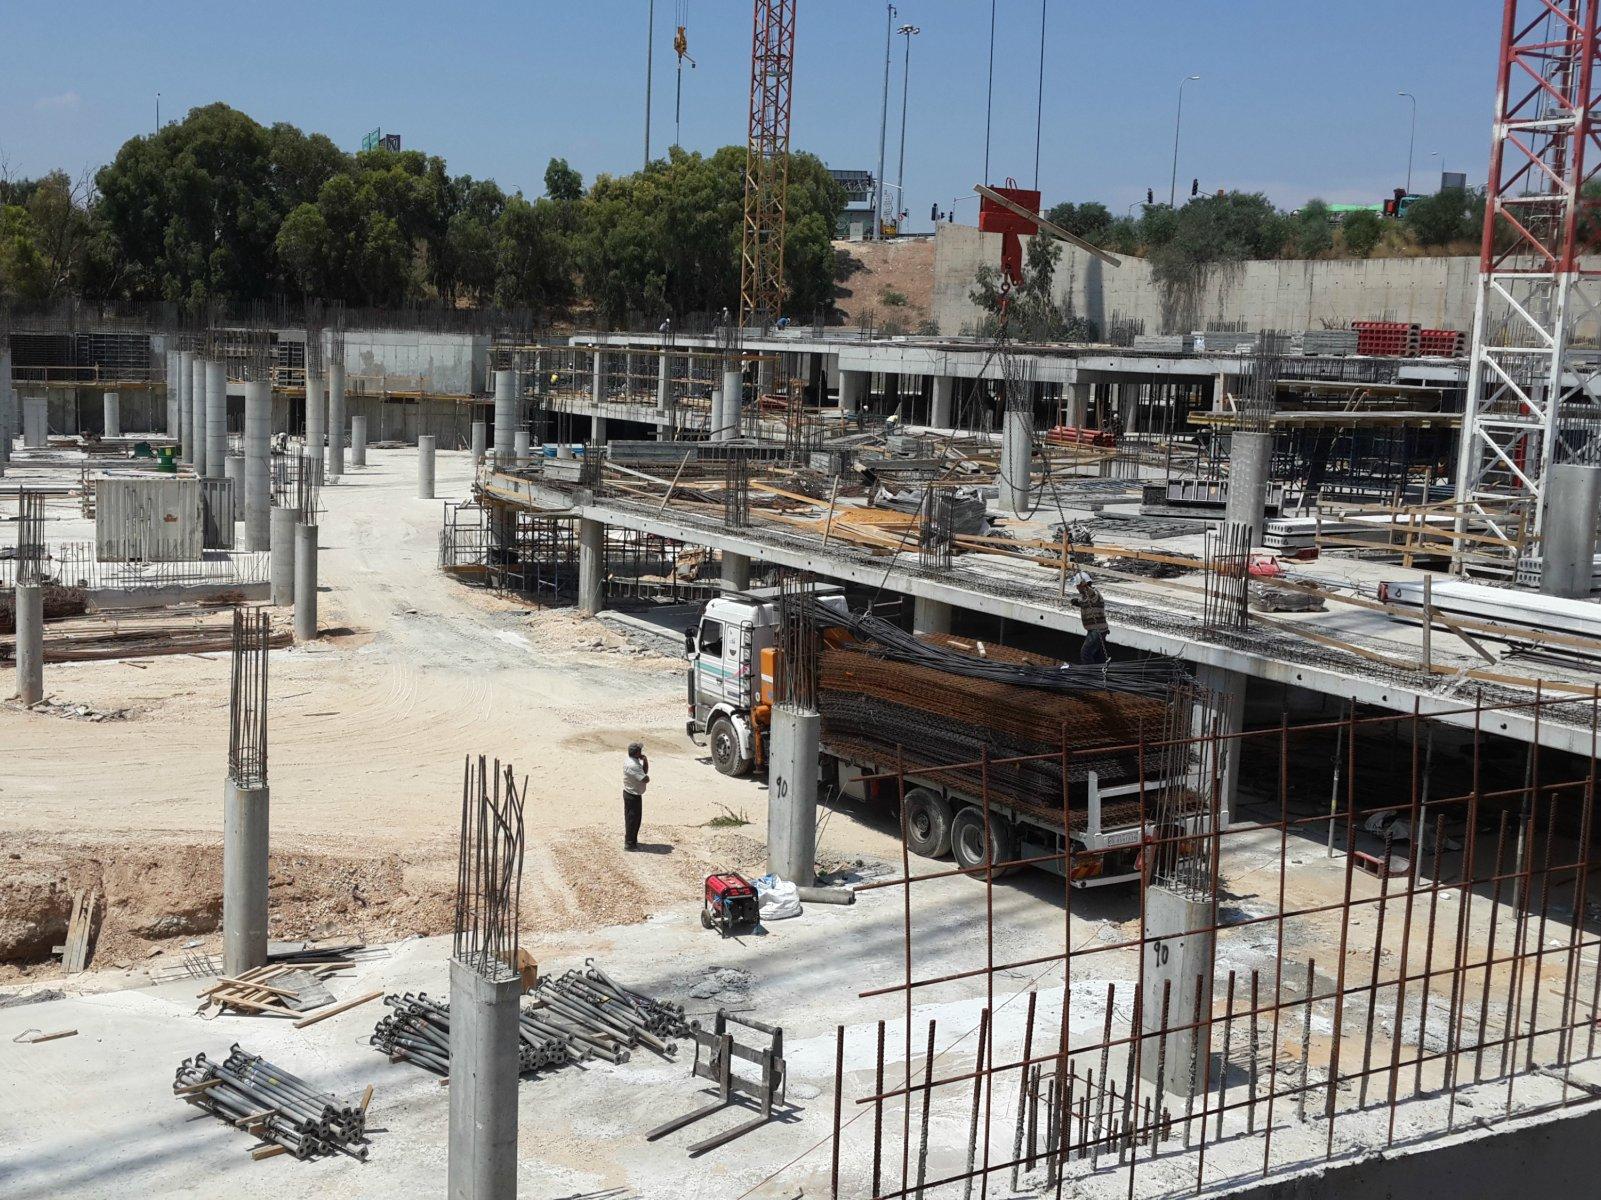 Globus City Kfar-Saba - chemical anchor resin CT50Pro